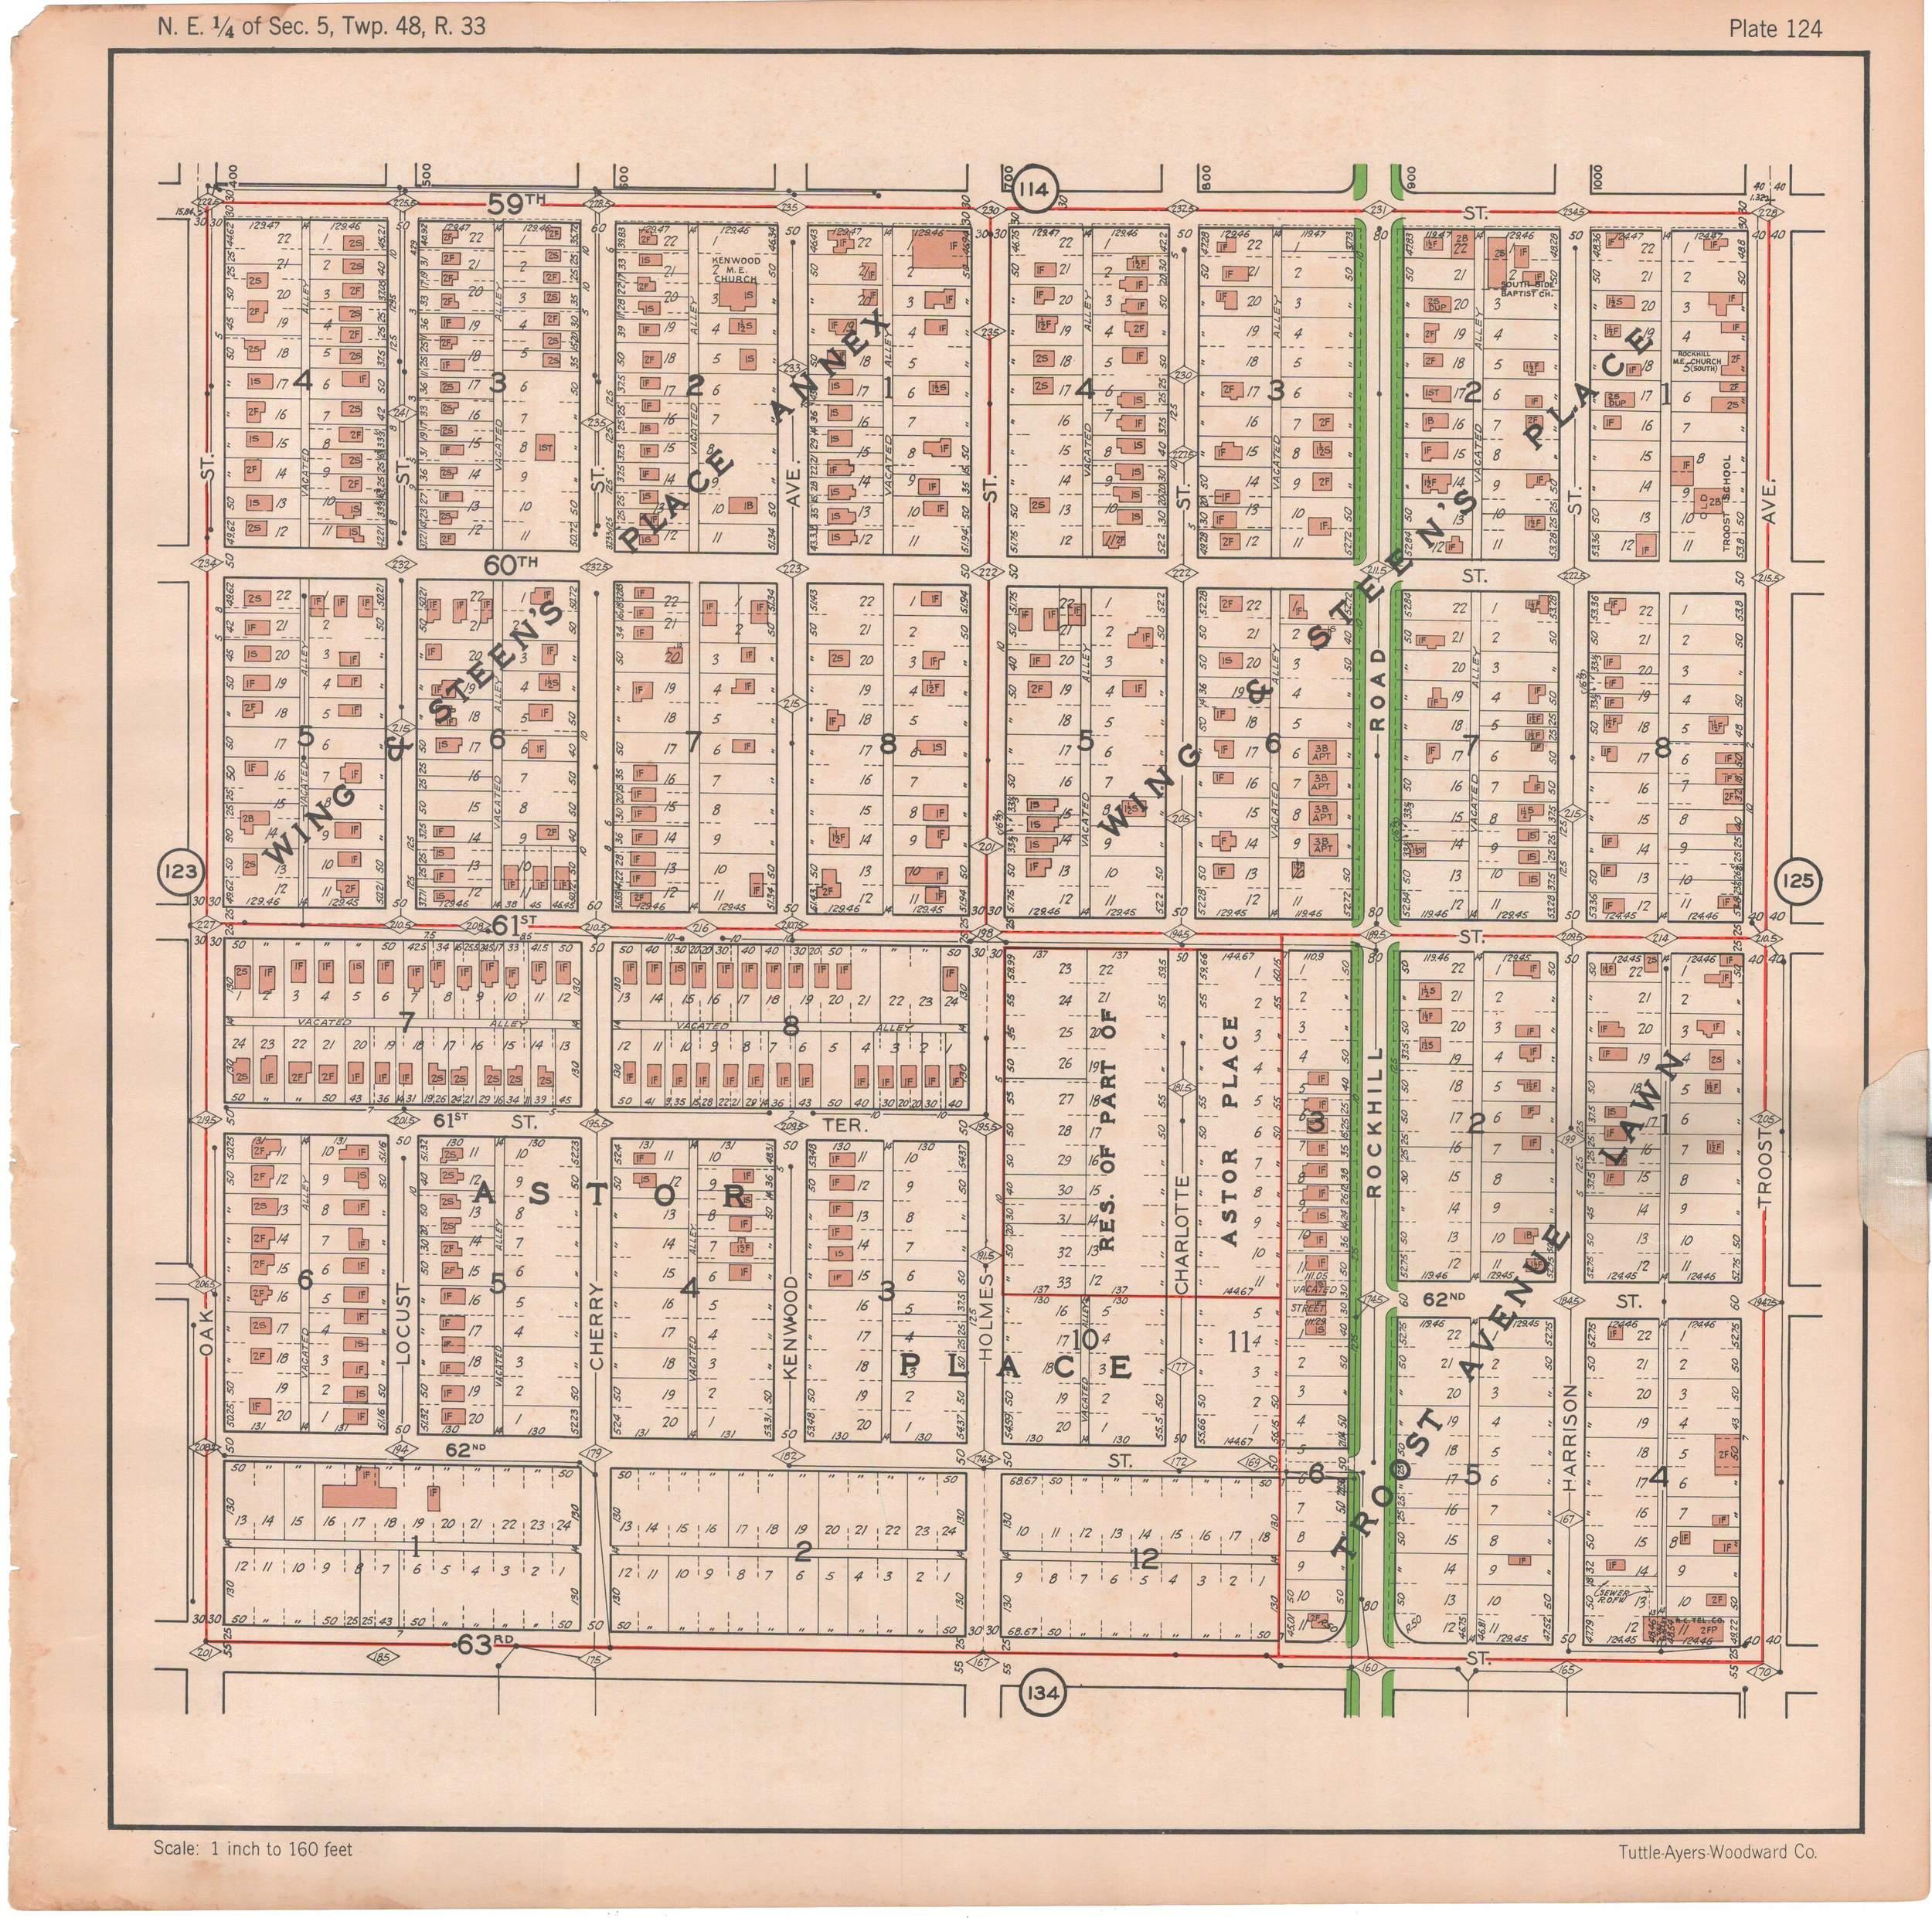 1925 TUTTLE_AYERS_Plate 124.JPG